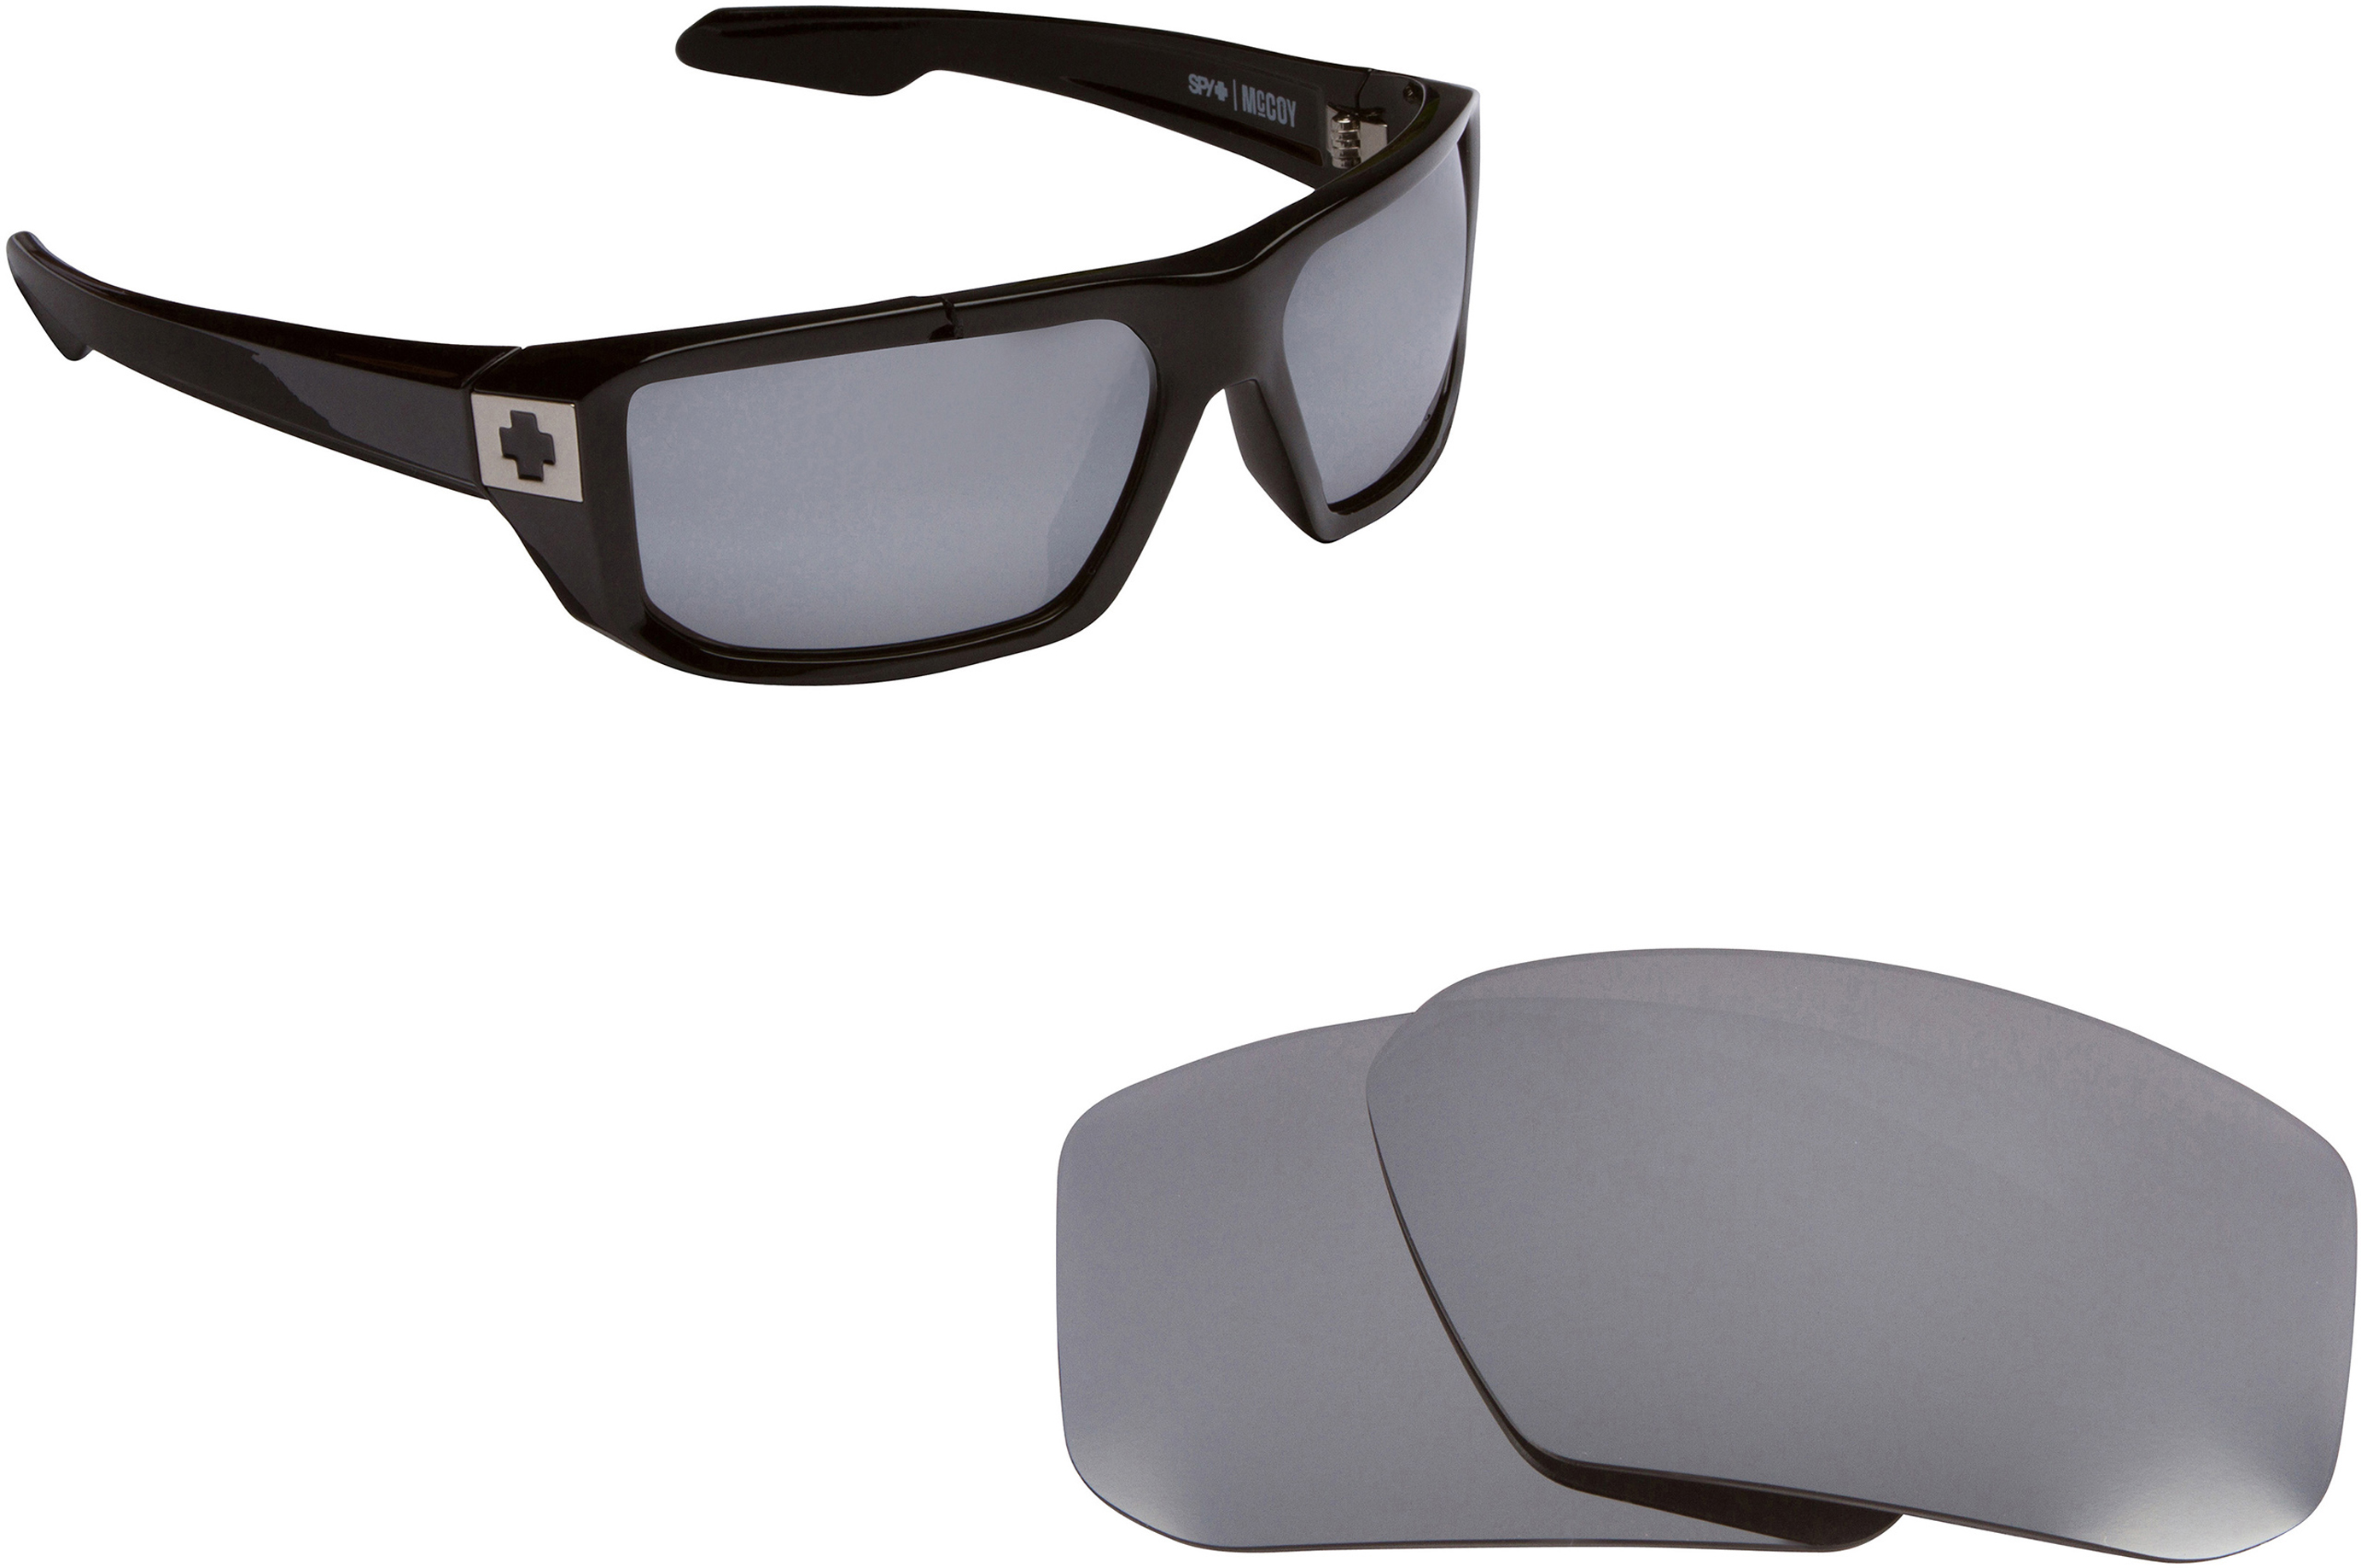 fb7163c8833 McCOY Replacement Lenses by SEEK OPTICS to fit SPY OPTICS Sunglasses ...